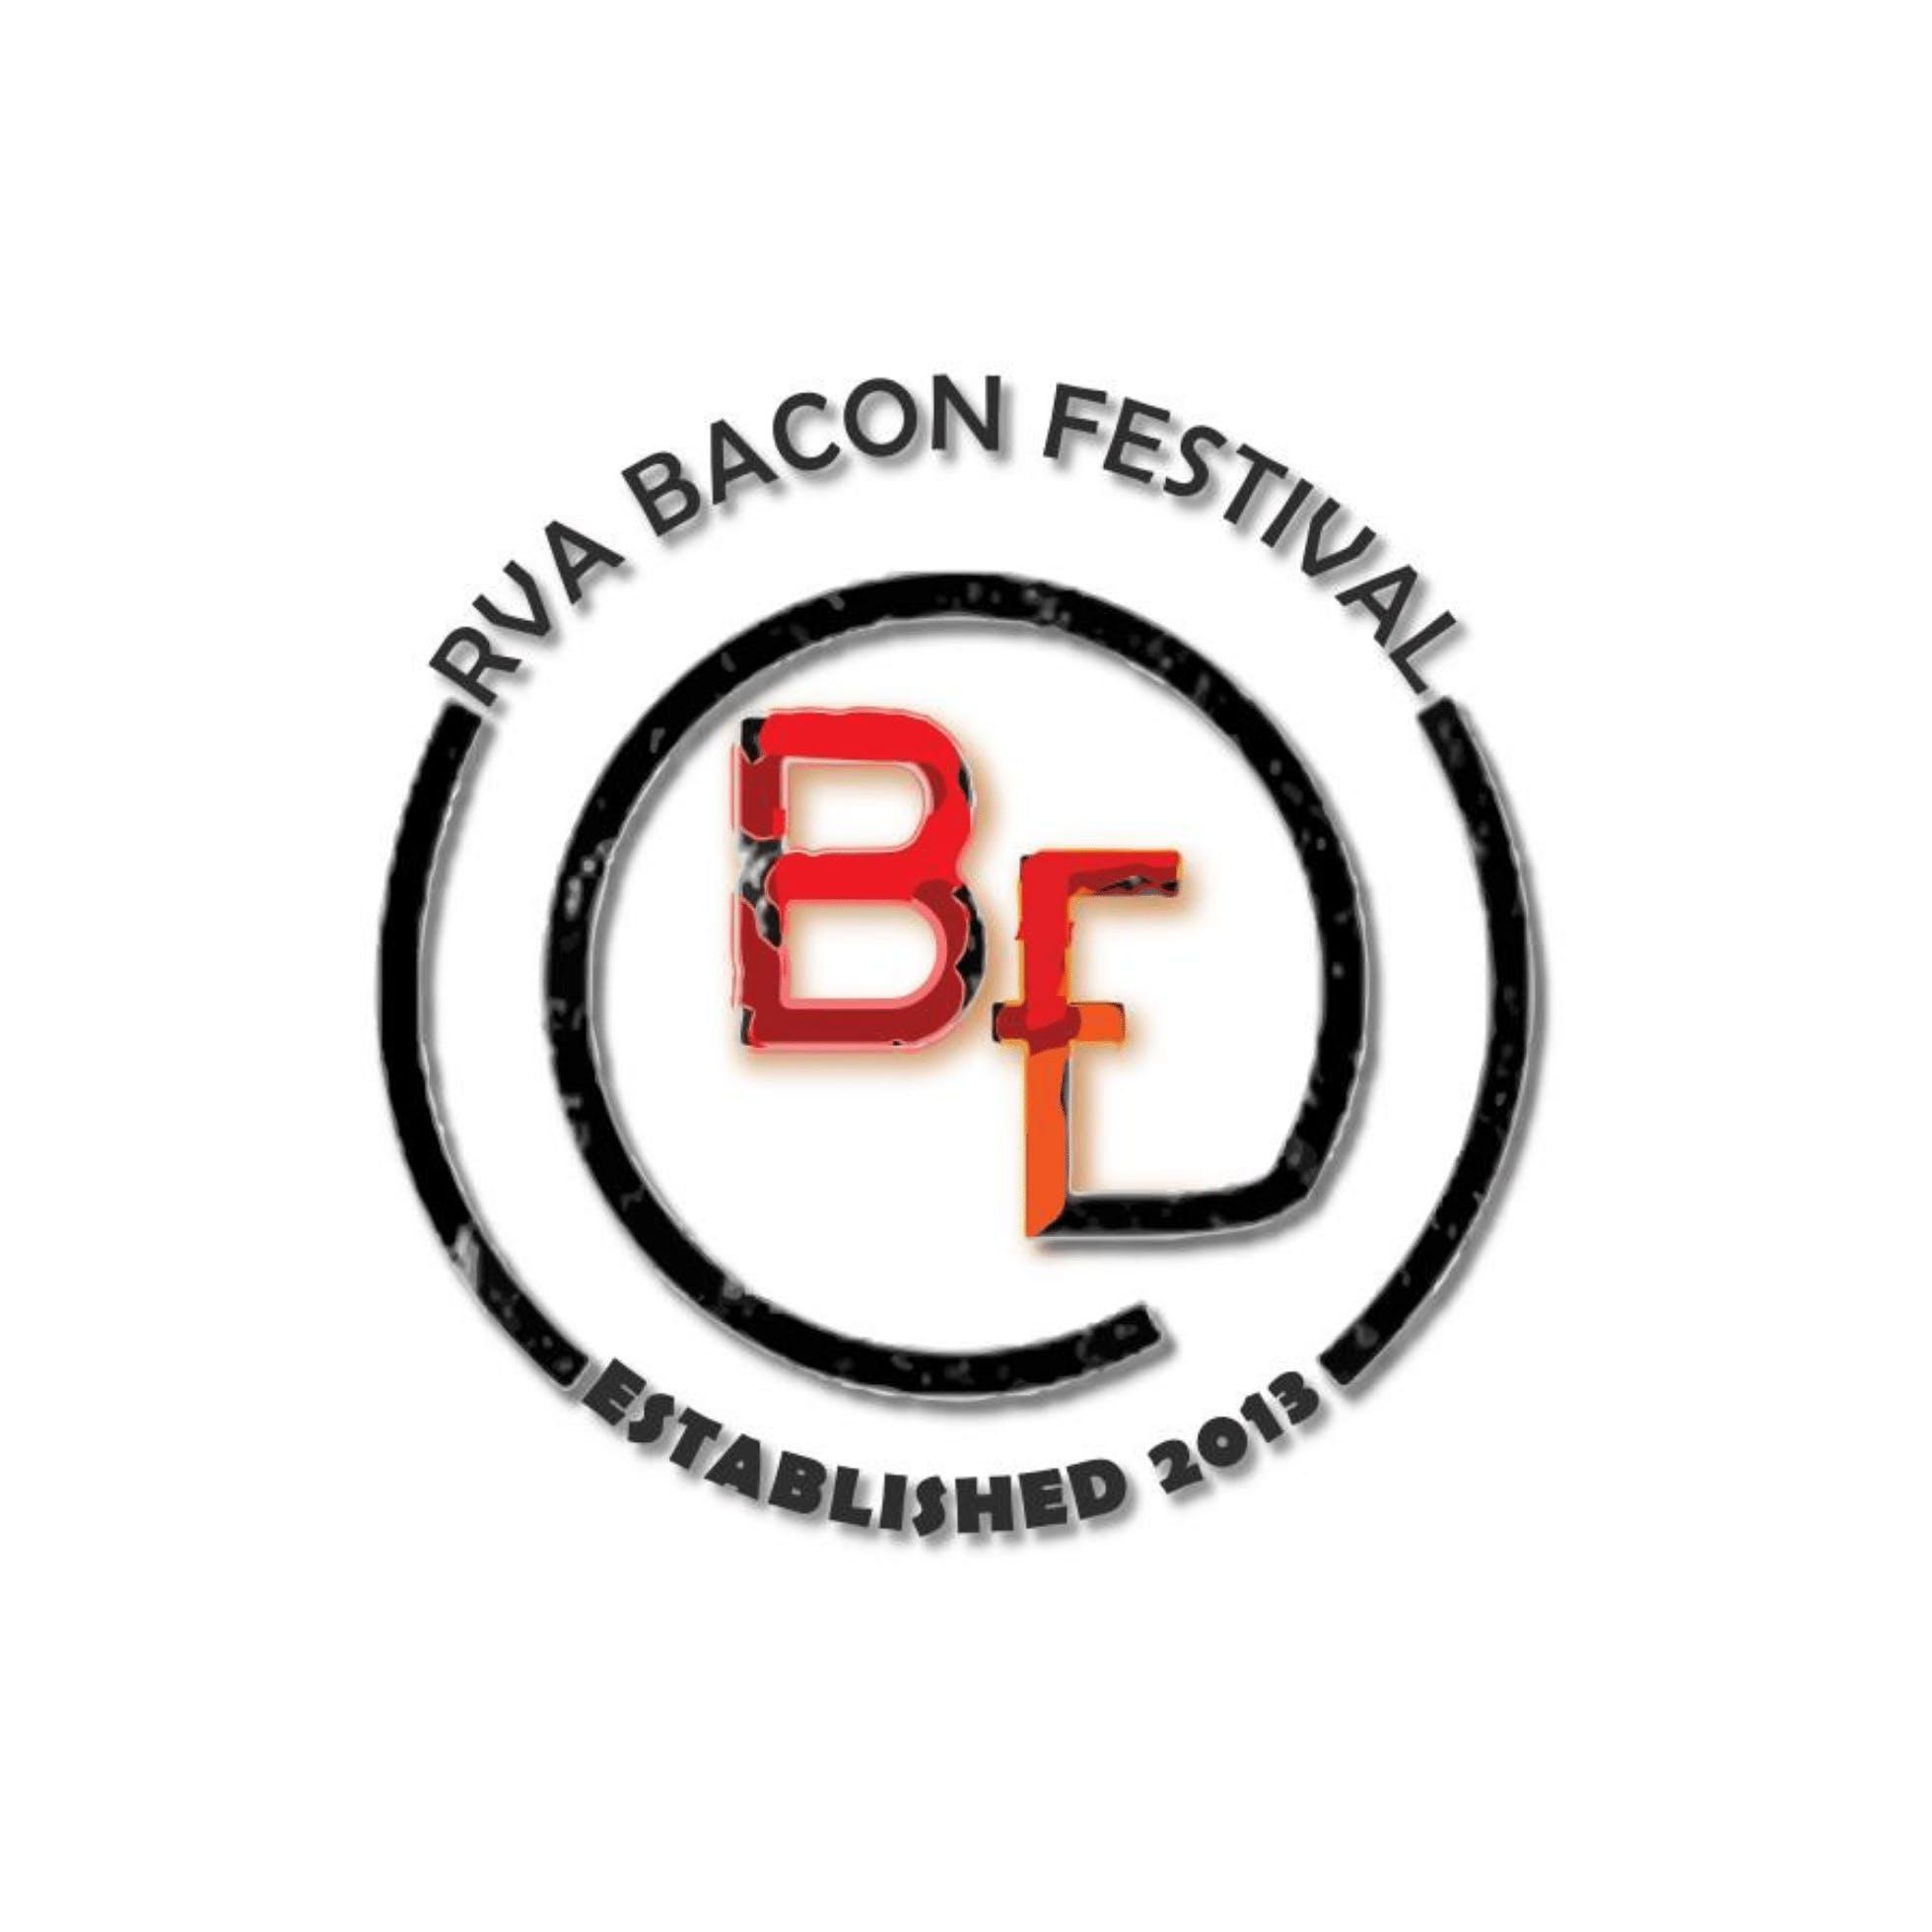 RVA Bacon Festival